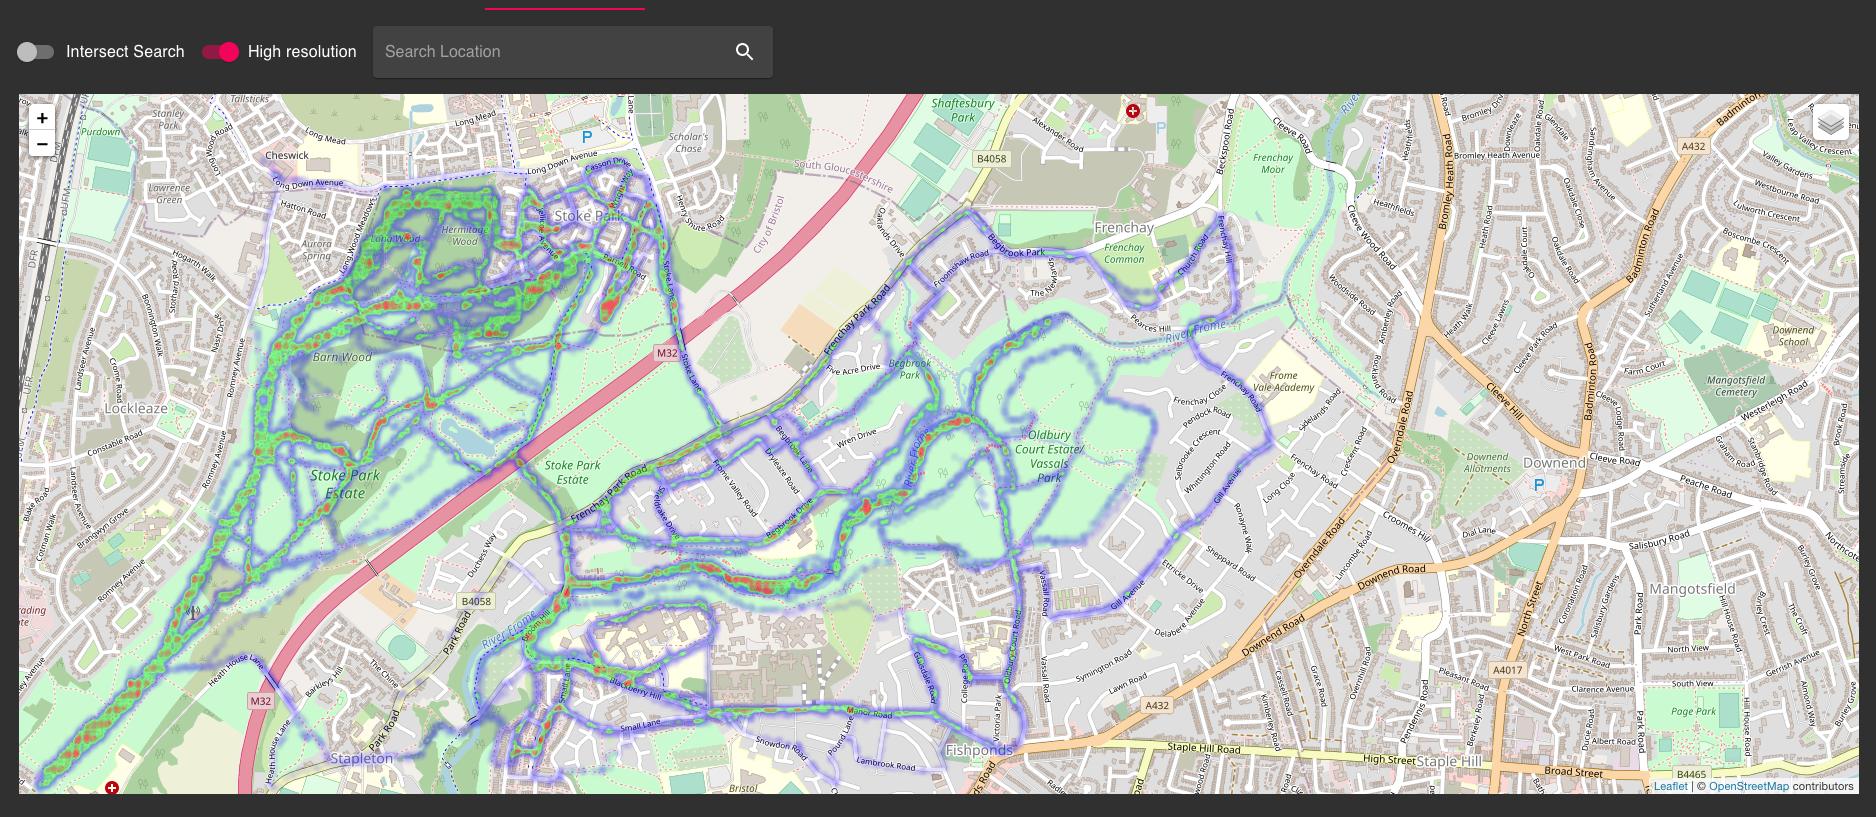 Pace/location heatmap